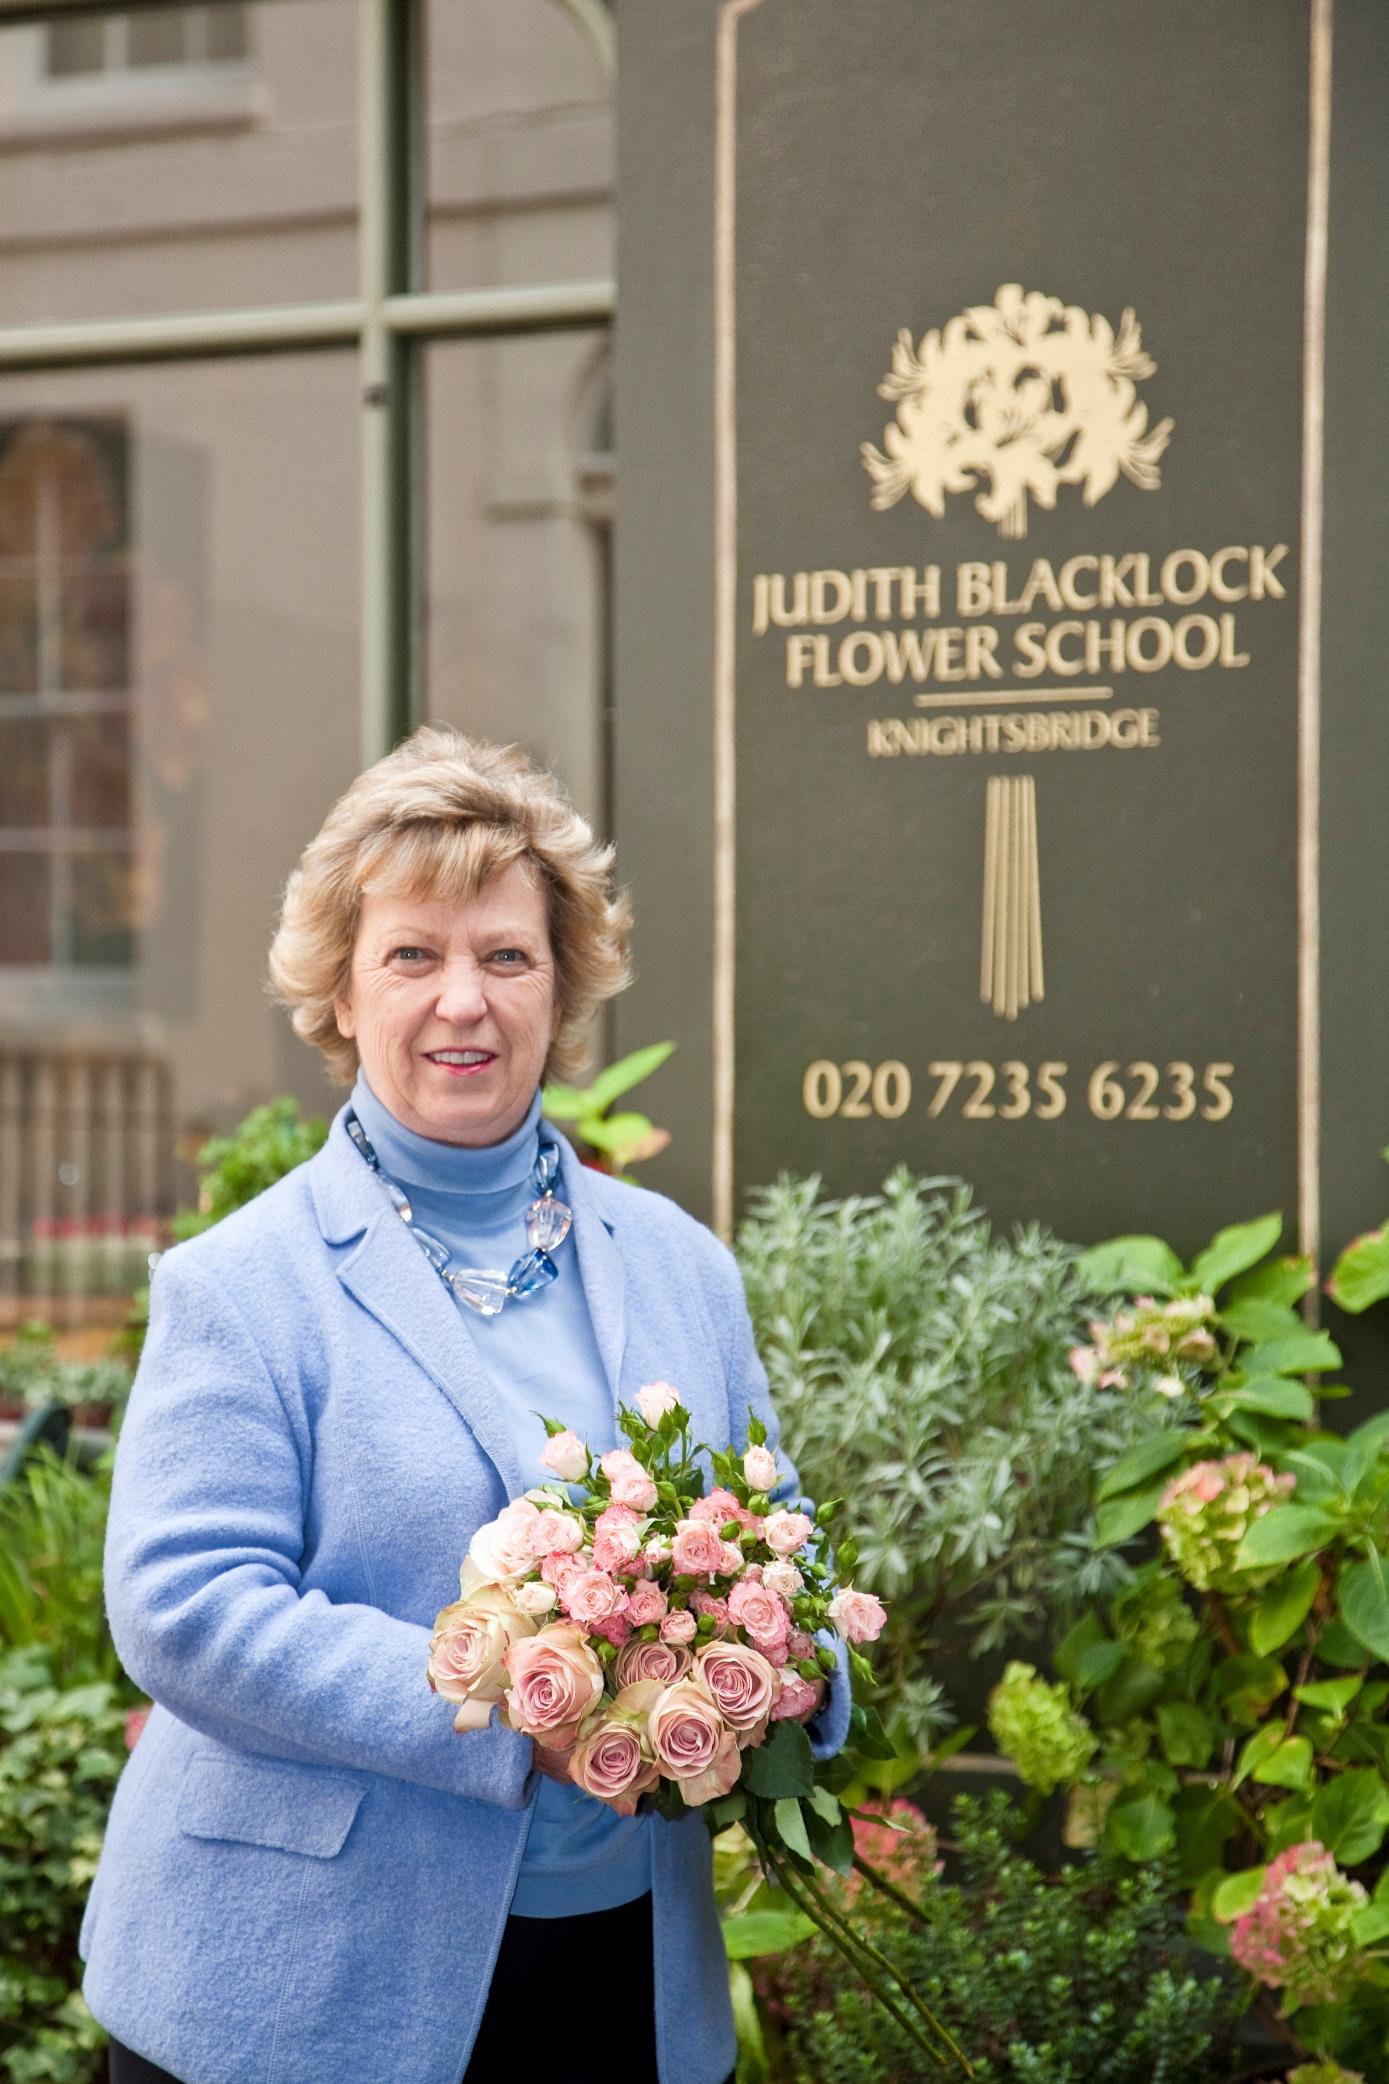 Judith Blacklock and pretty flower bouquet